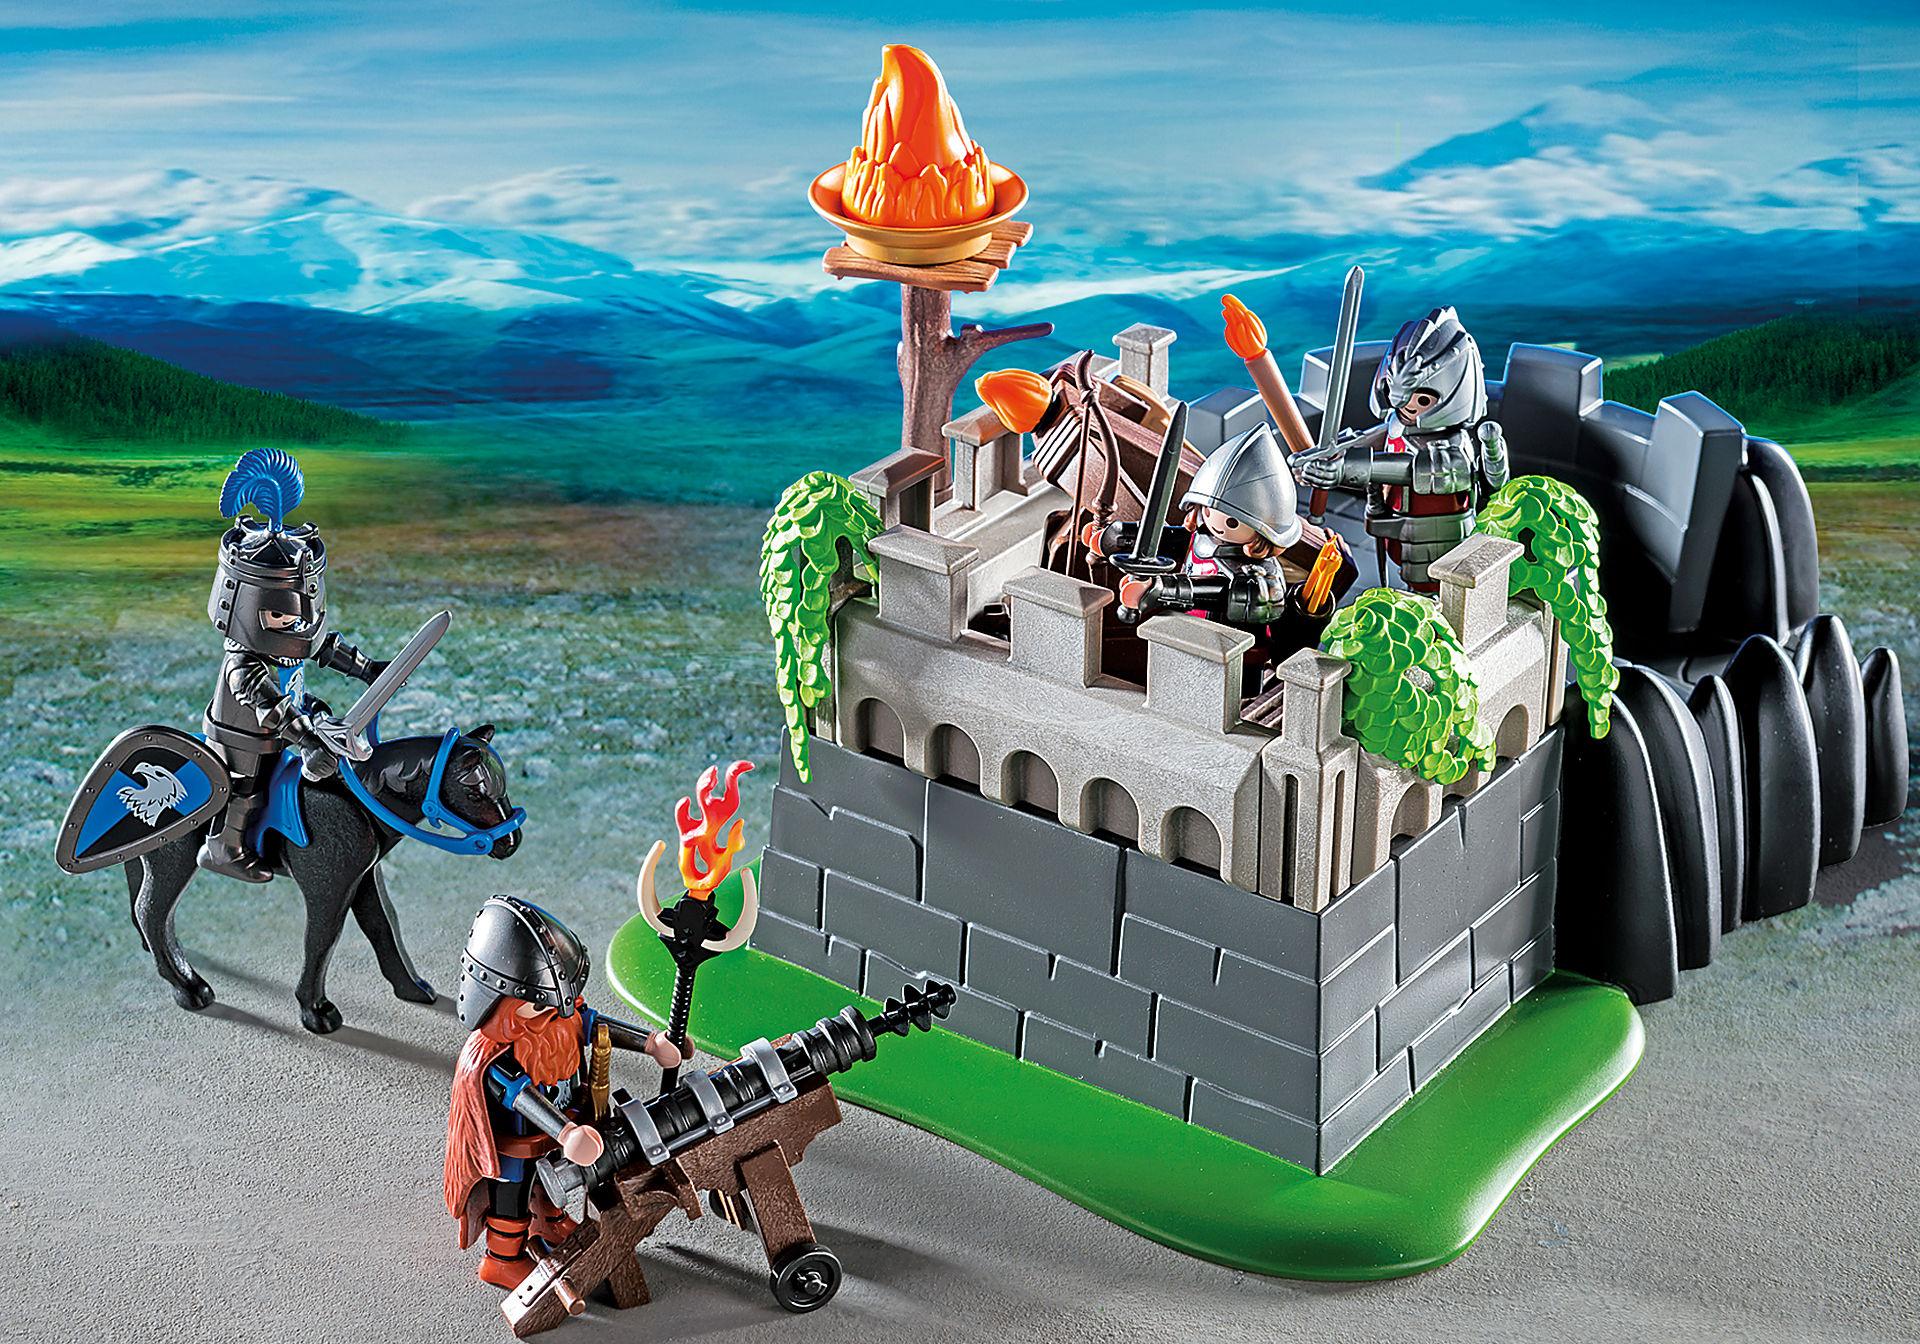 http://media.playmobil.com/i/playmobil/6627_product_extra2/Rocca dei cavalieri del dragone